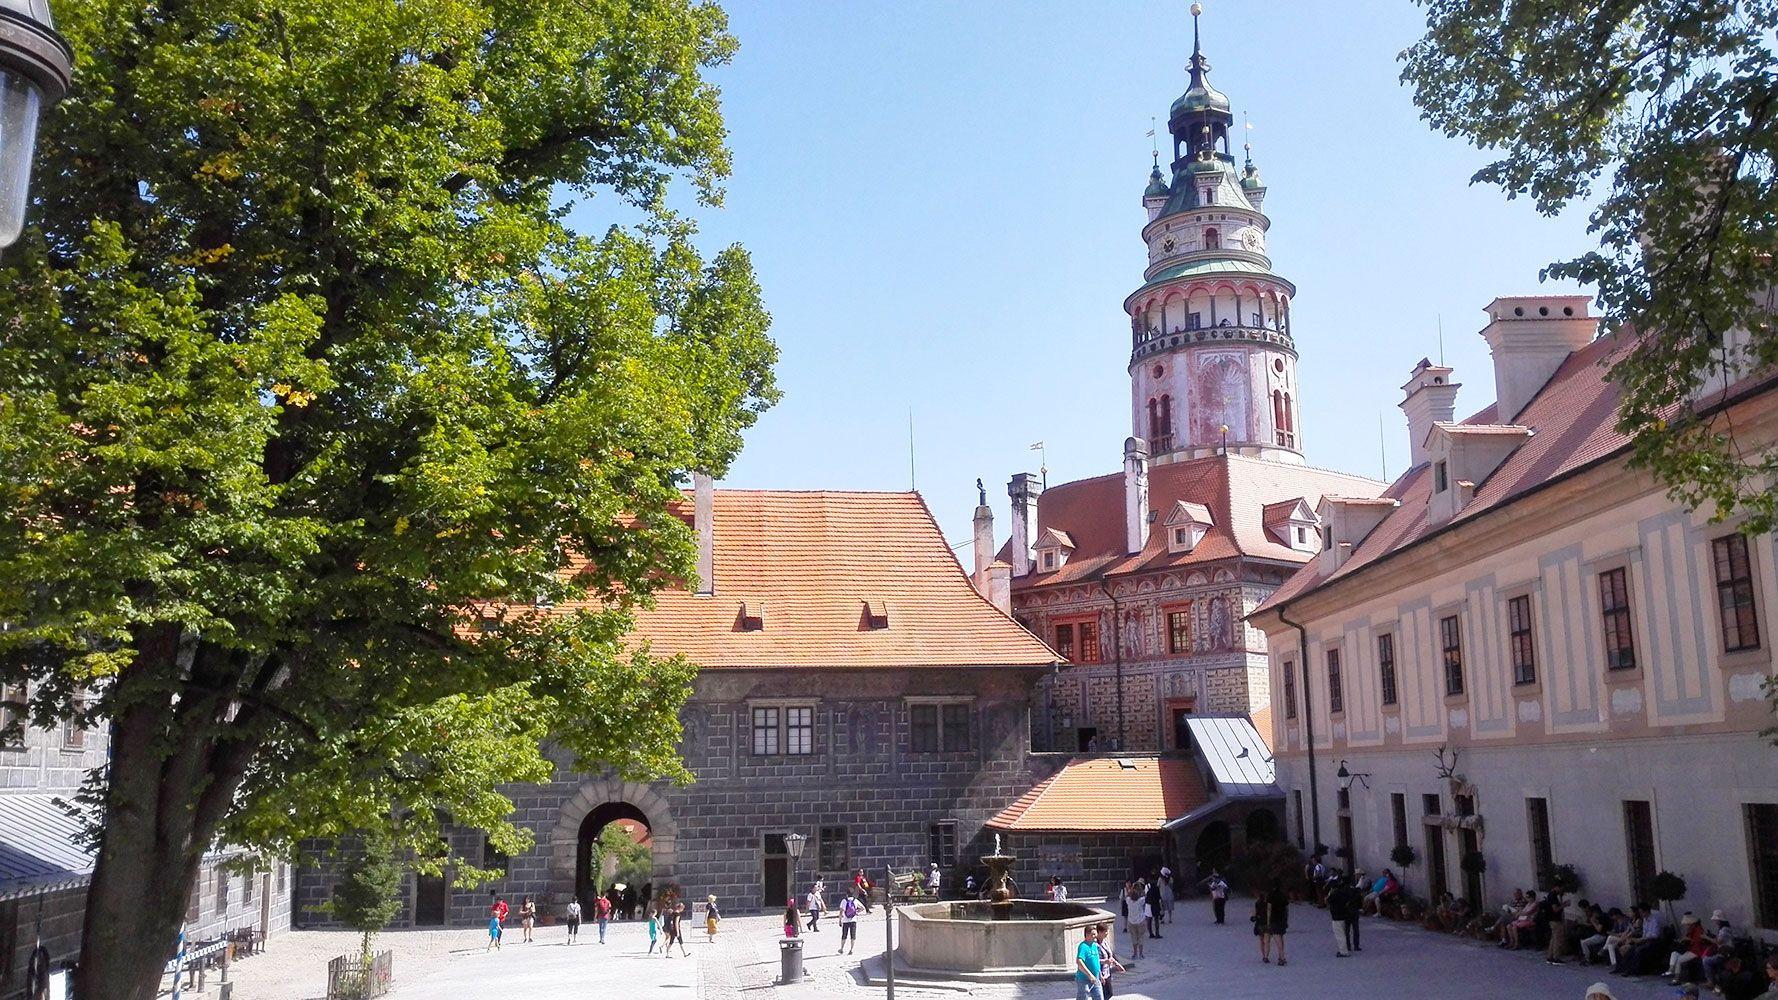 Český Krumlov, inner courtyard of the castle